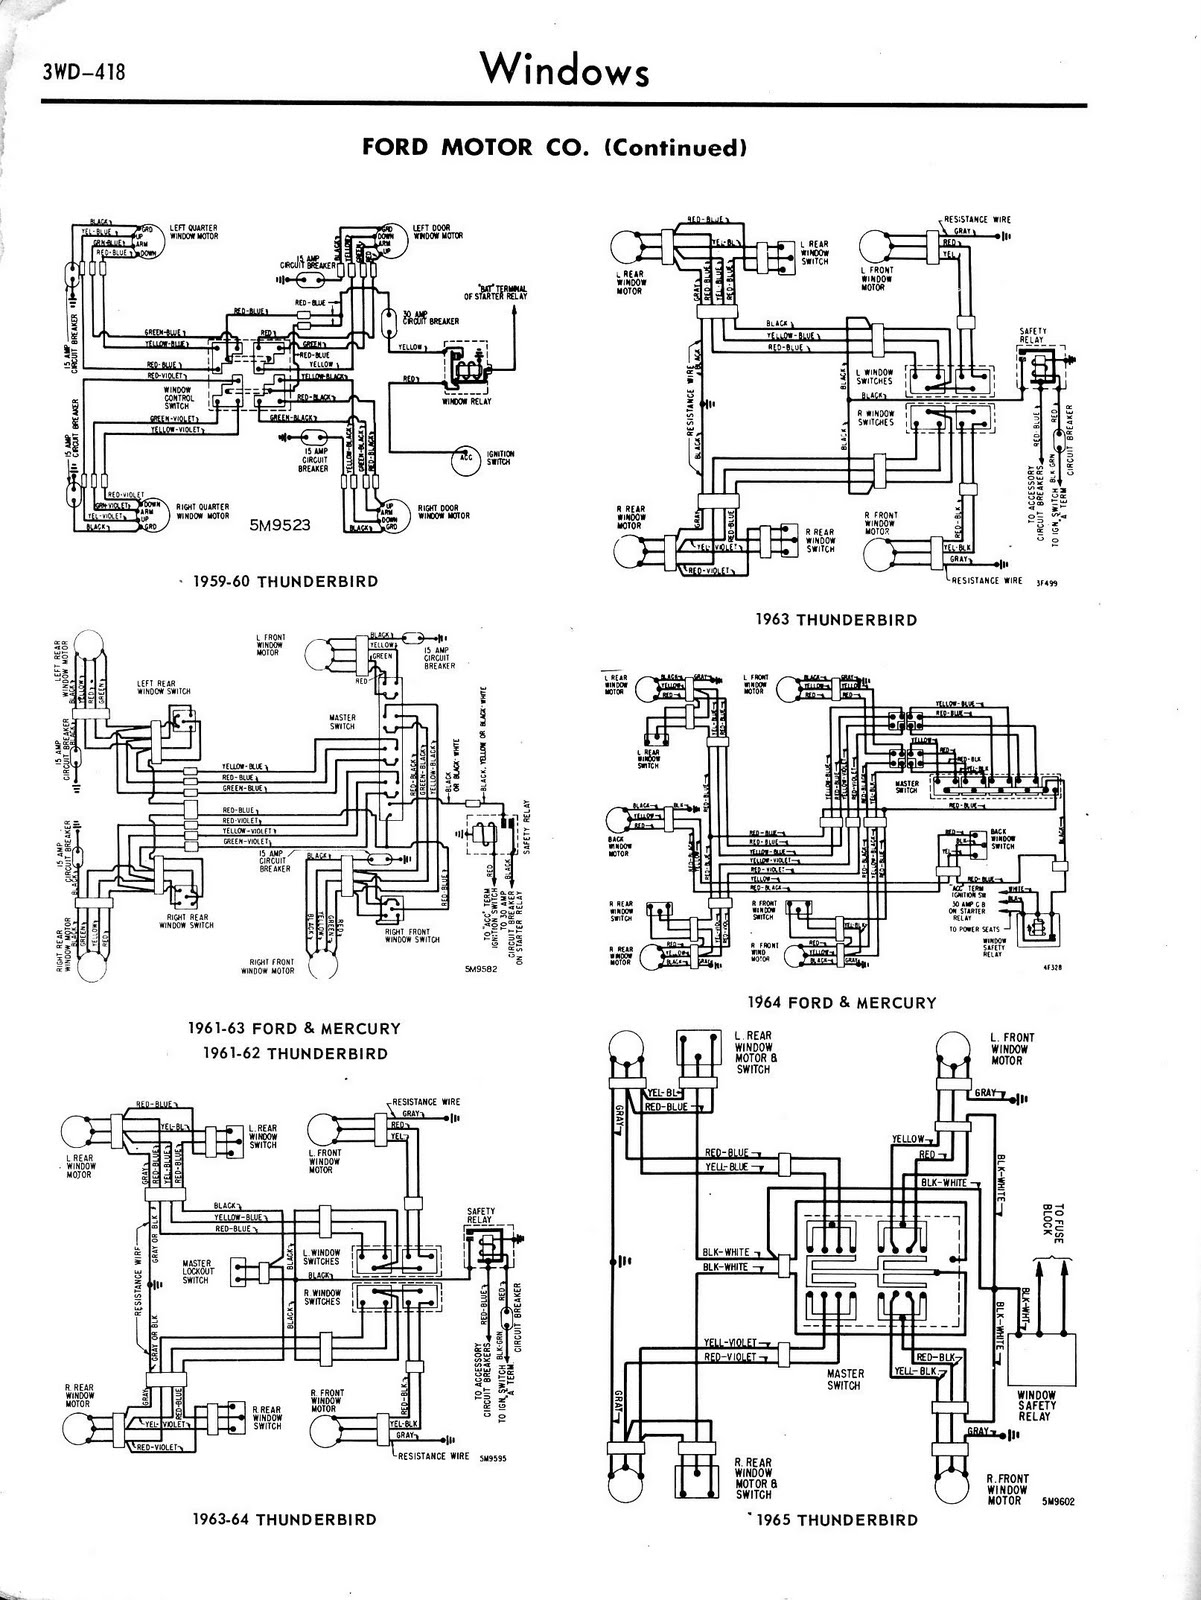 2006 Gto Power Windows Wiring Diagram Schematic Diagrams 2004 Fuse Box Wire Data 1969